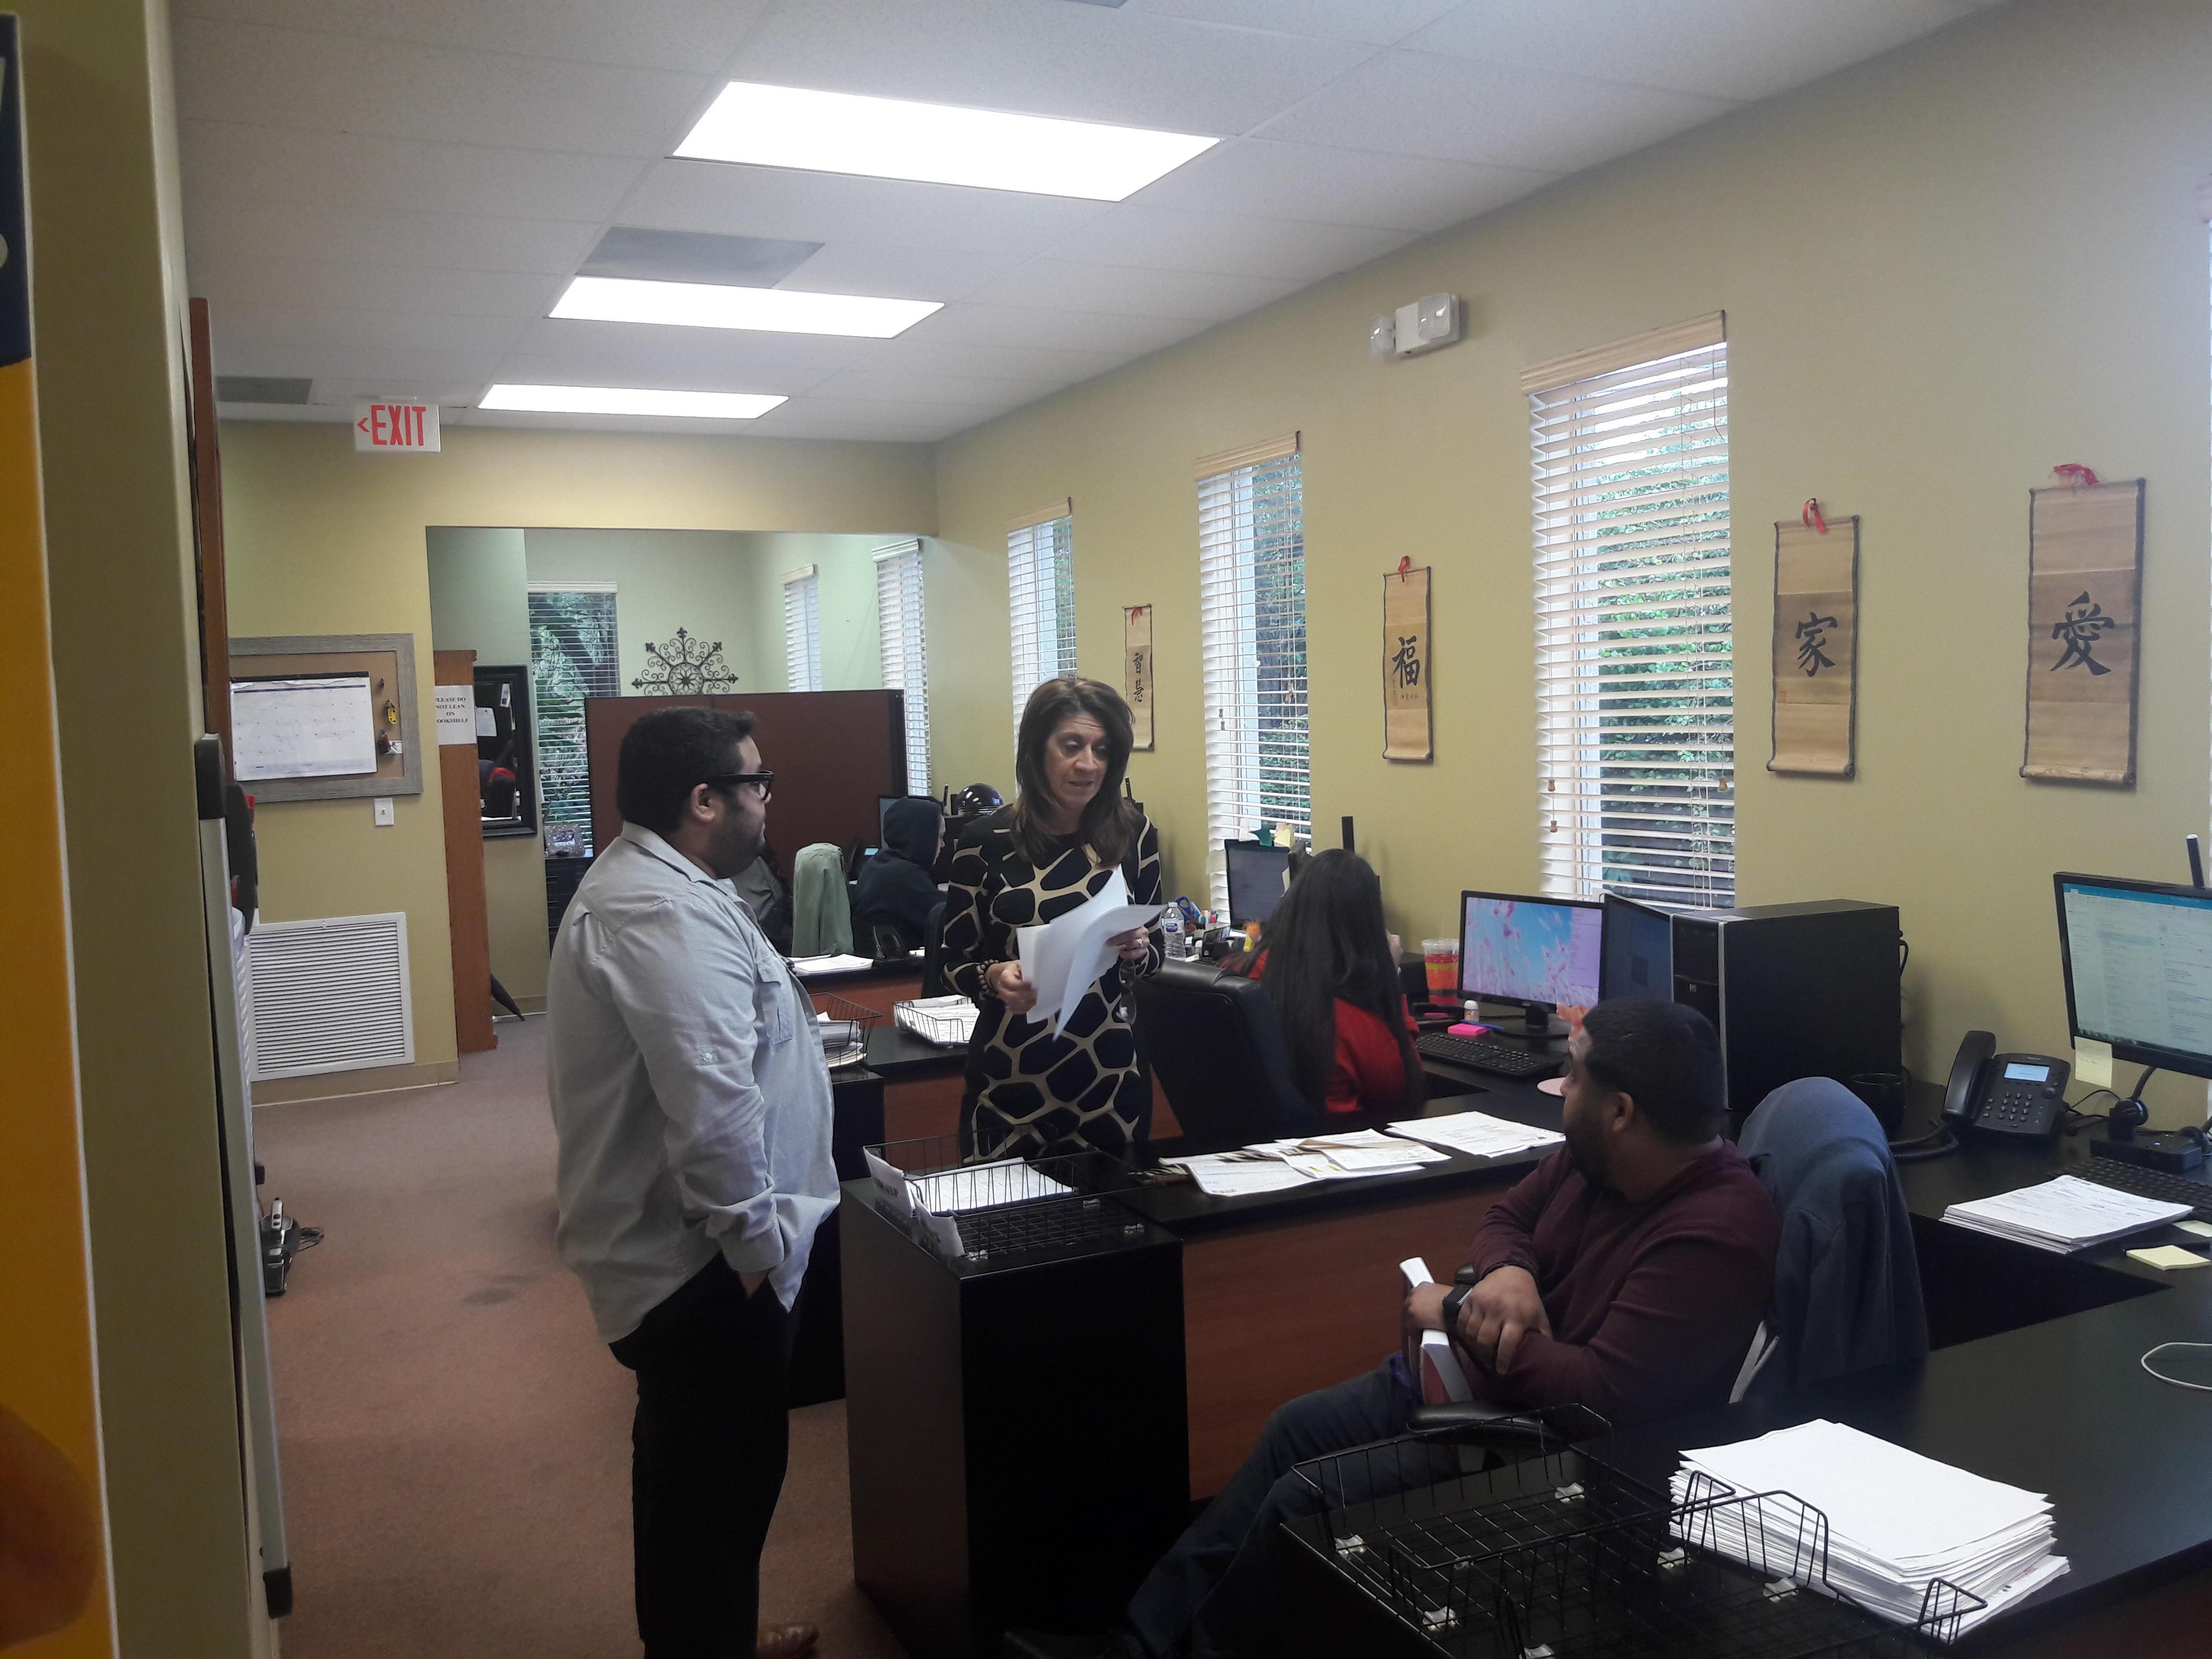 NMS Management Services, Inc. image 4